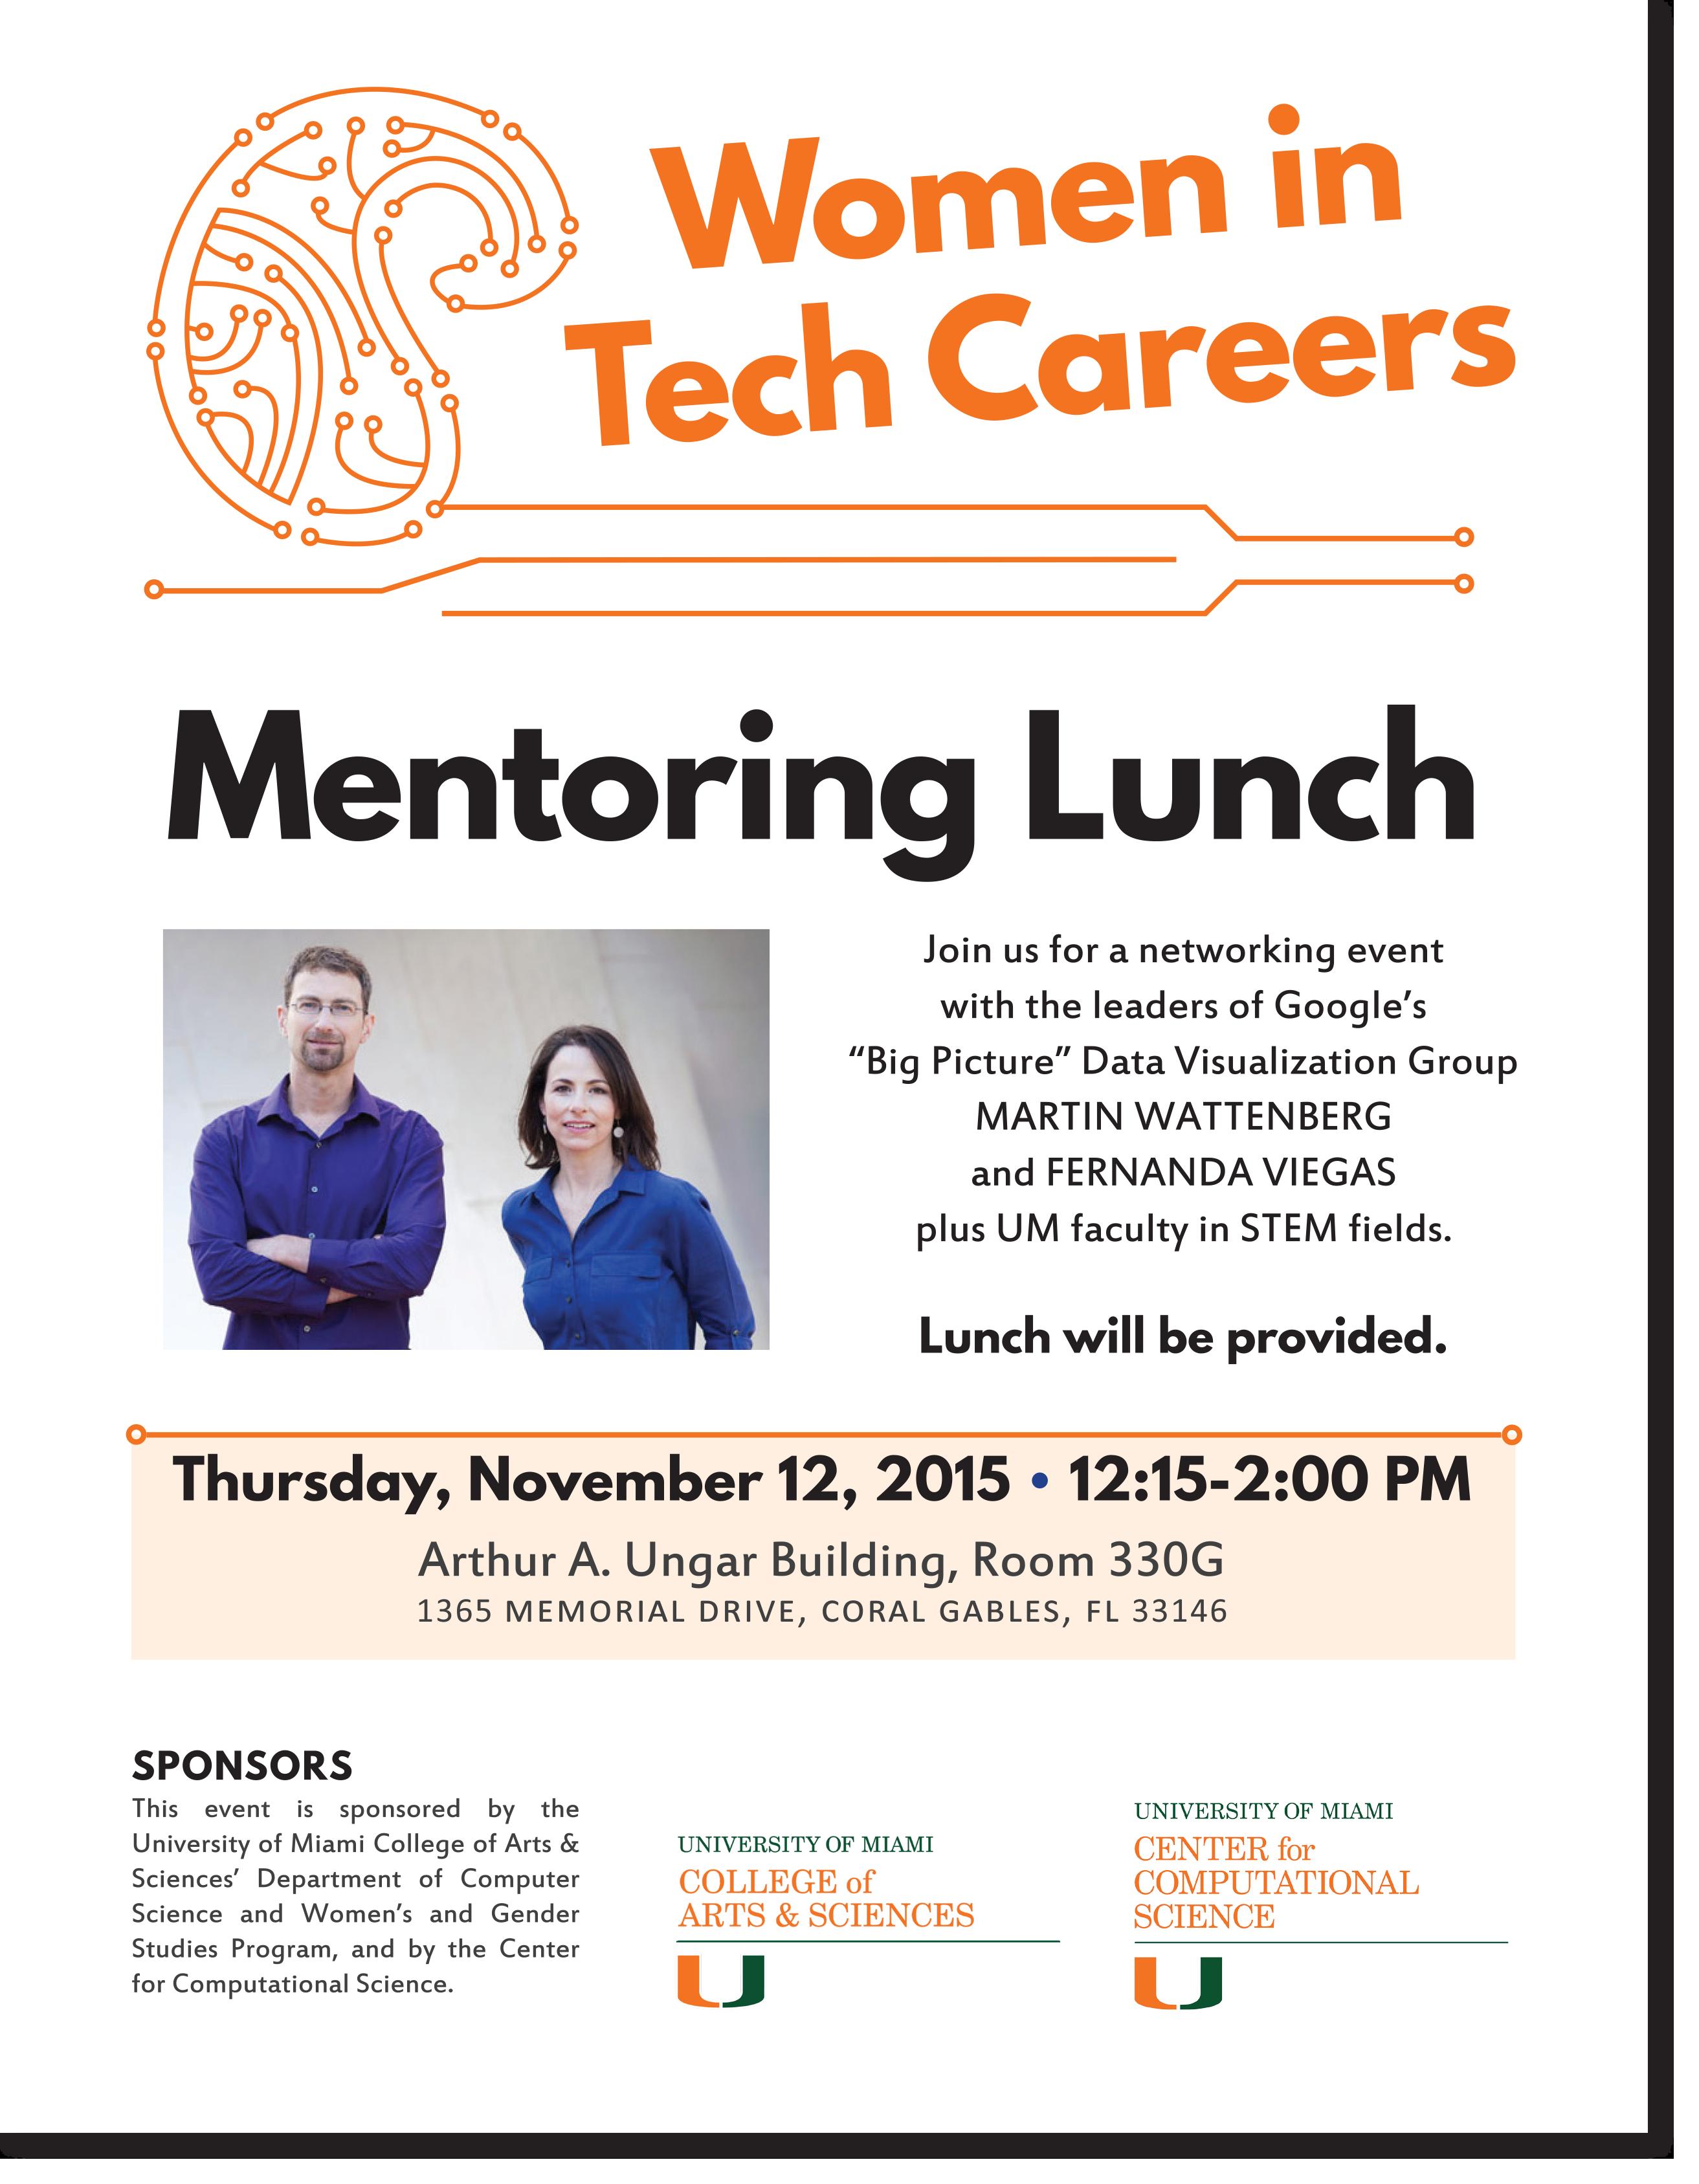 Women in Tech Careers Mentoring Lunch